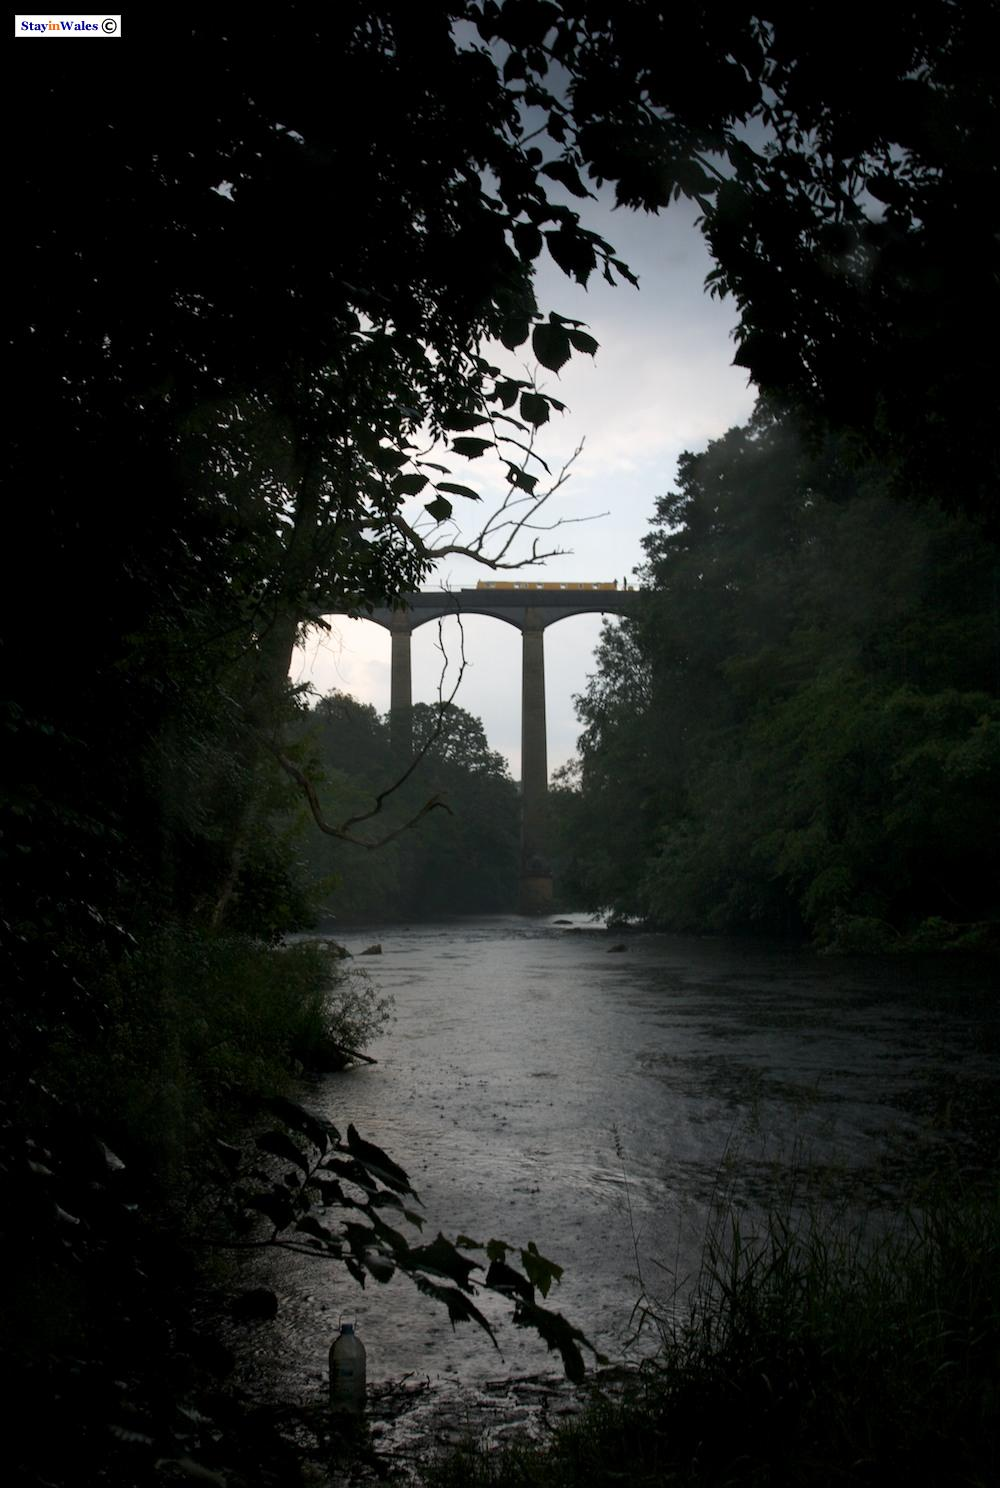 Pontcysyllte Aqueduct in a Storm